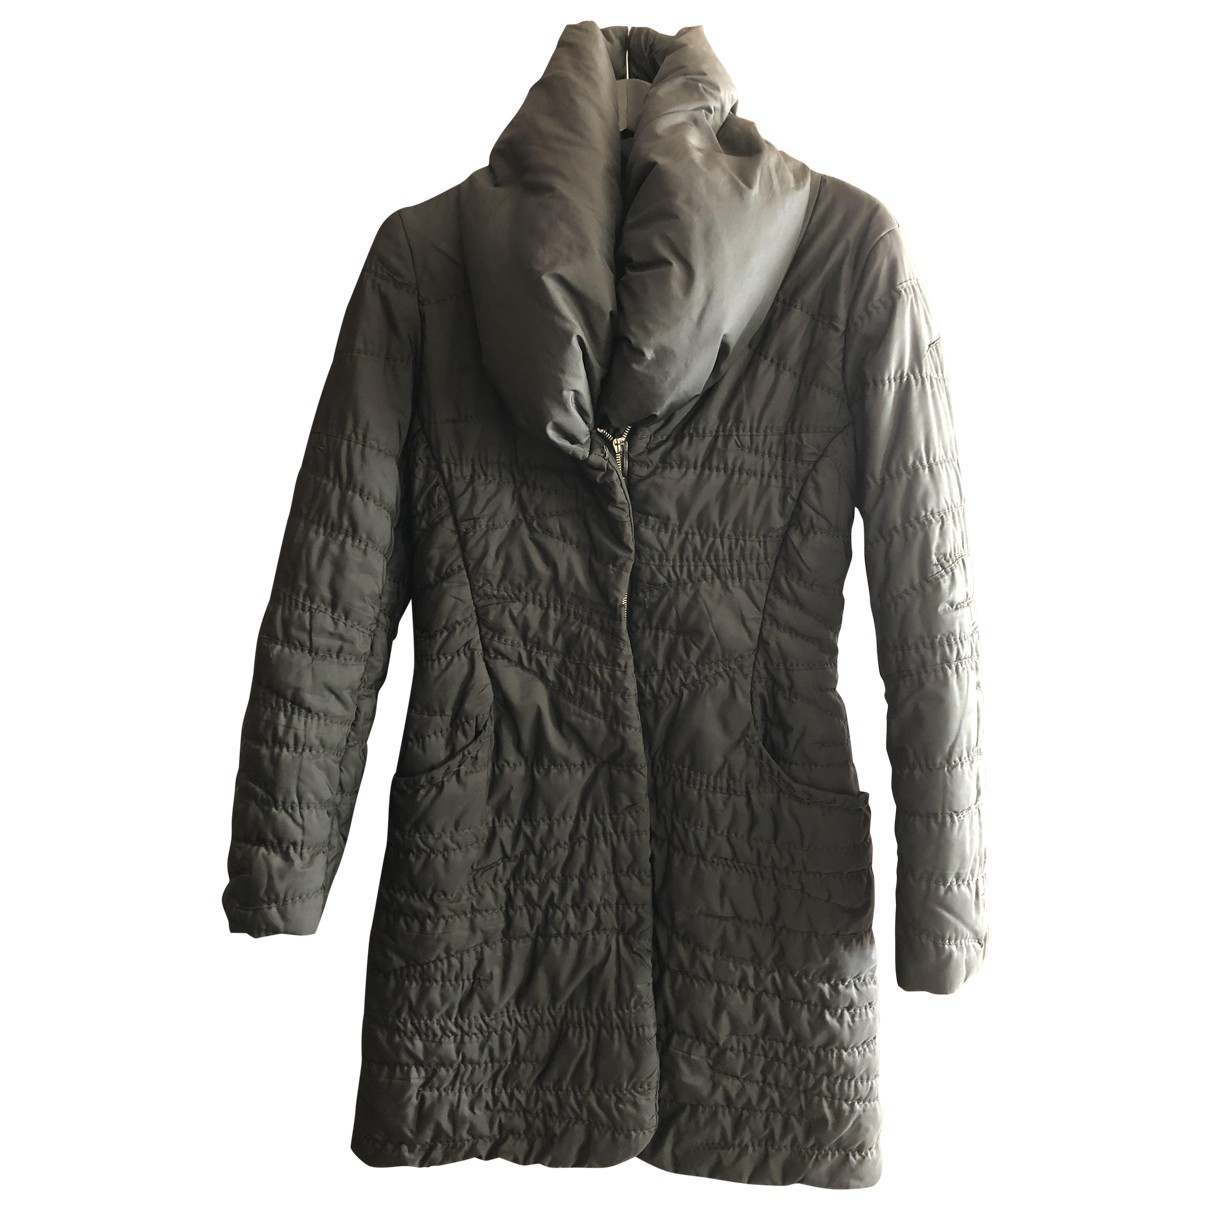 Ermanno Scervino \N Black coat for Women 44 IT